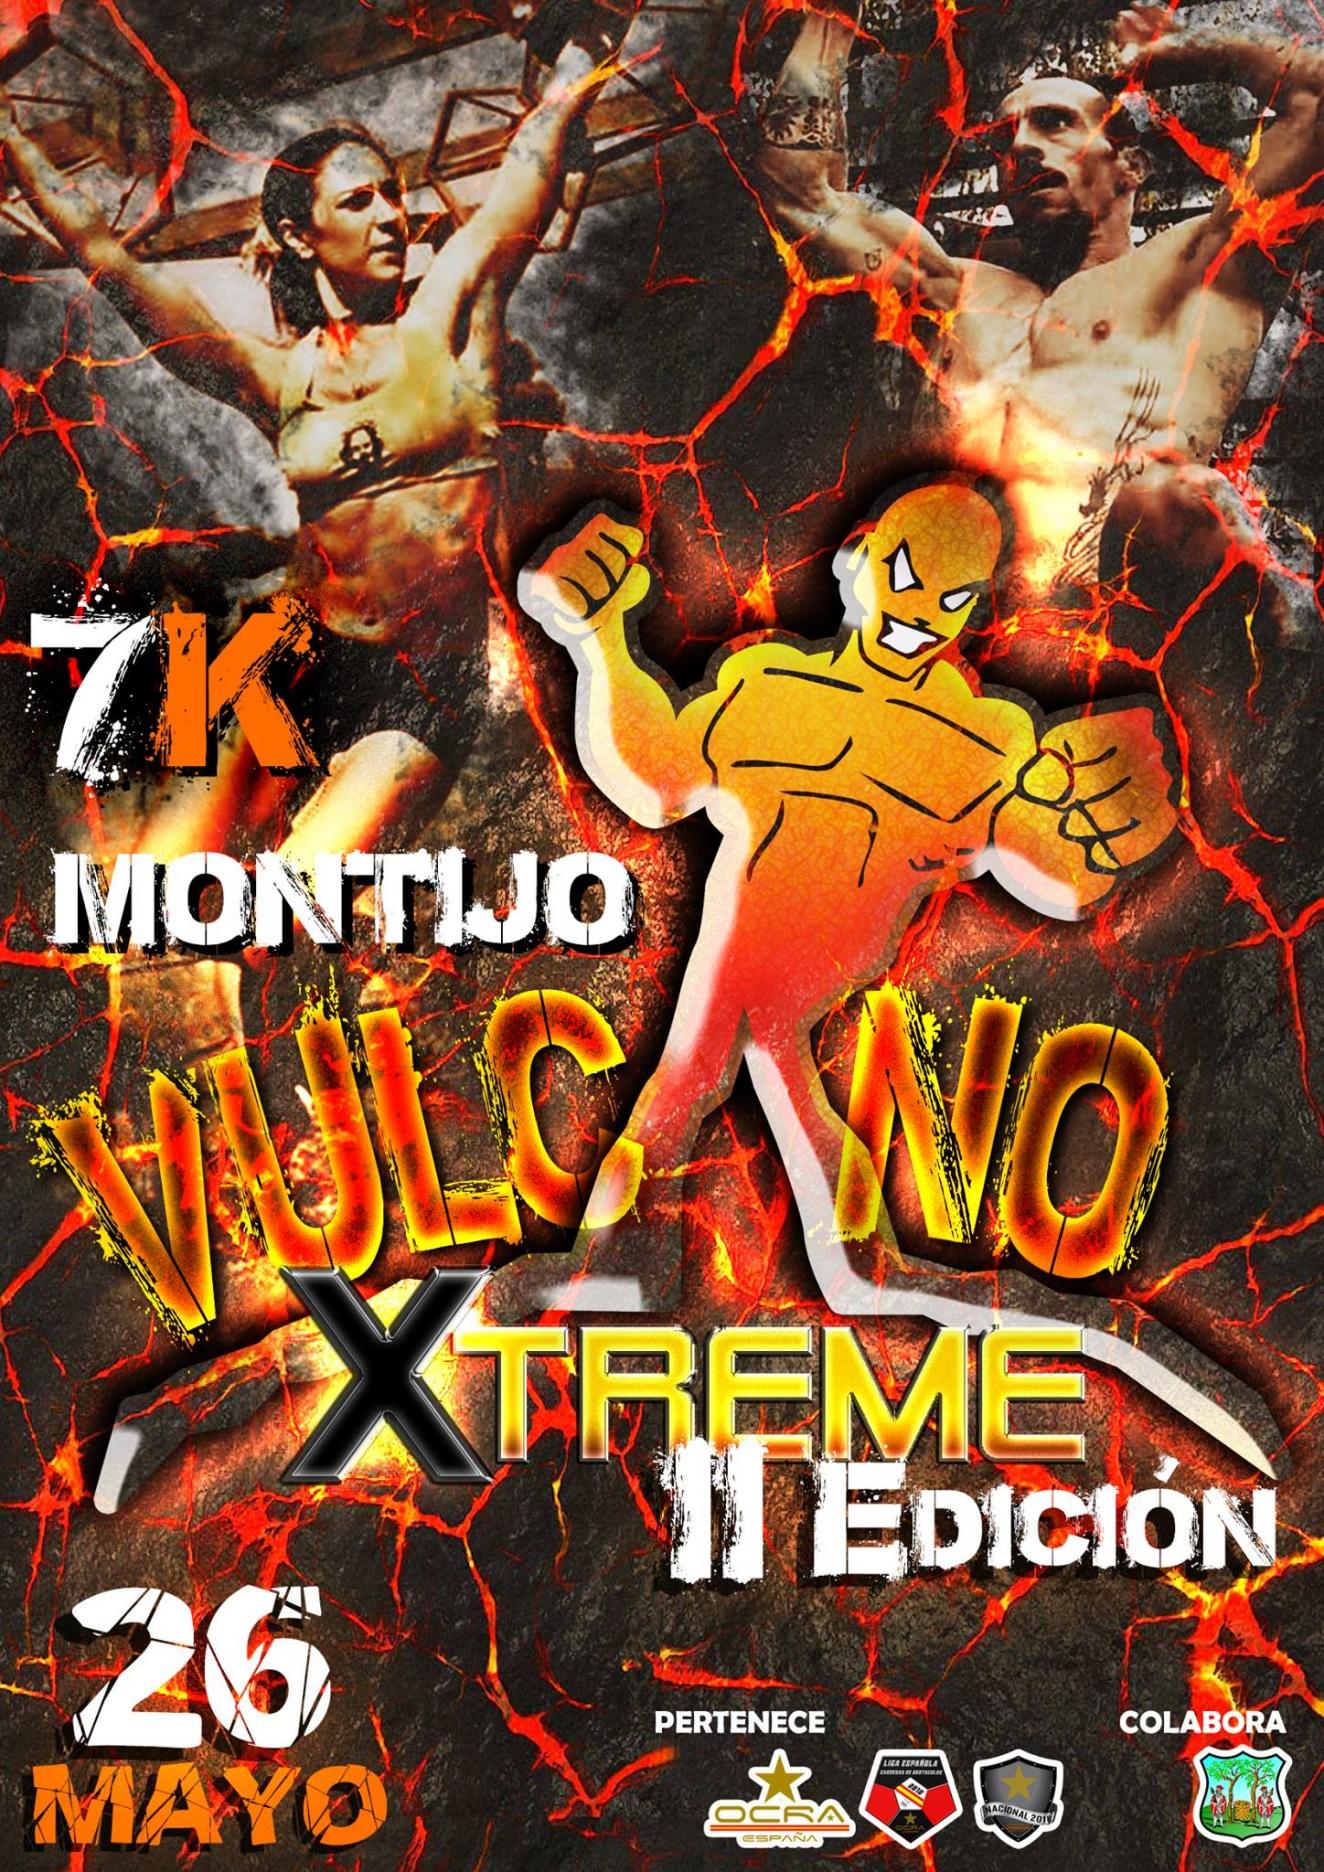 Vulcano Xtreme II Edición Montijo